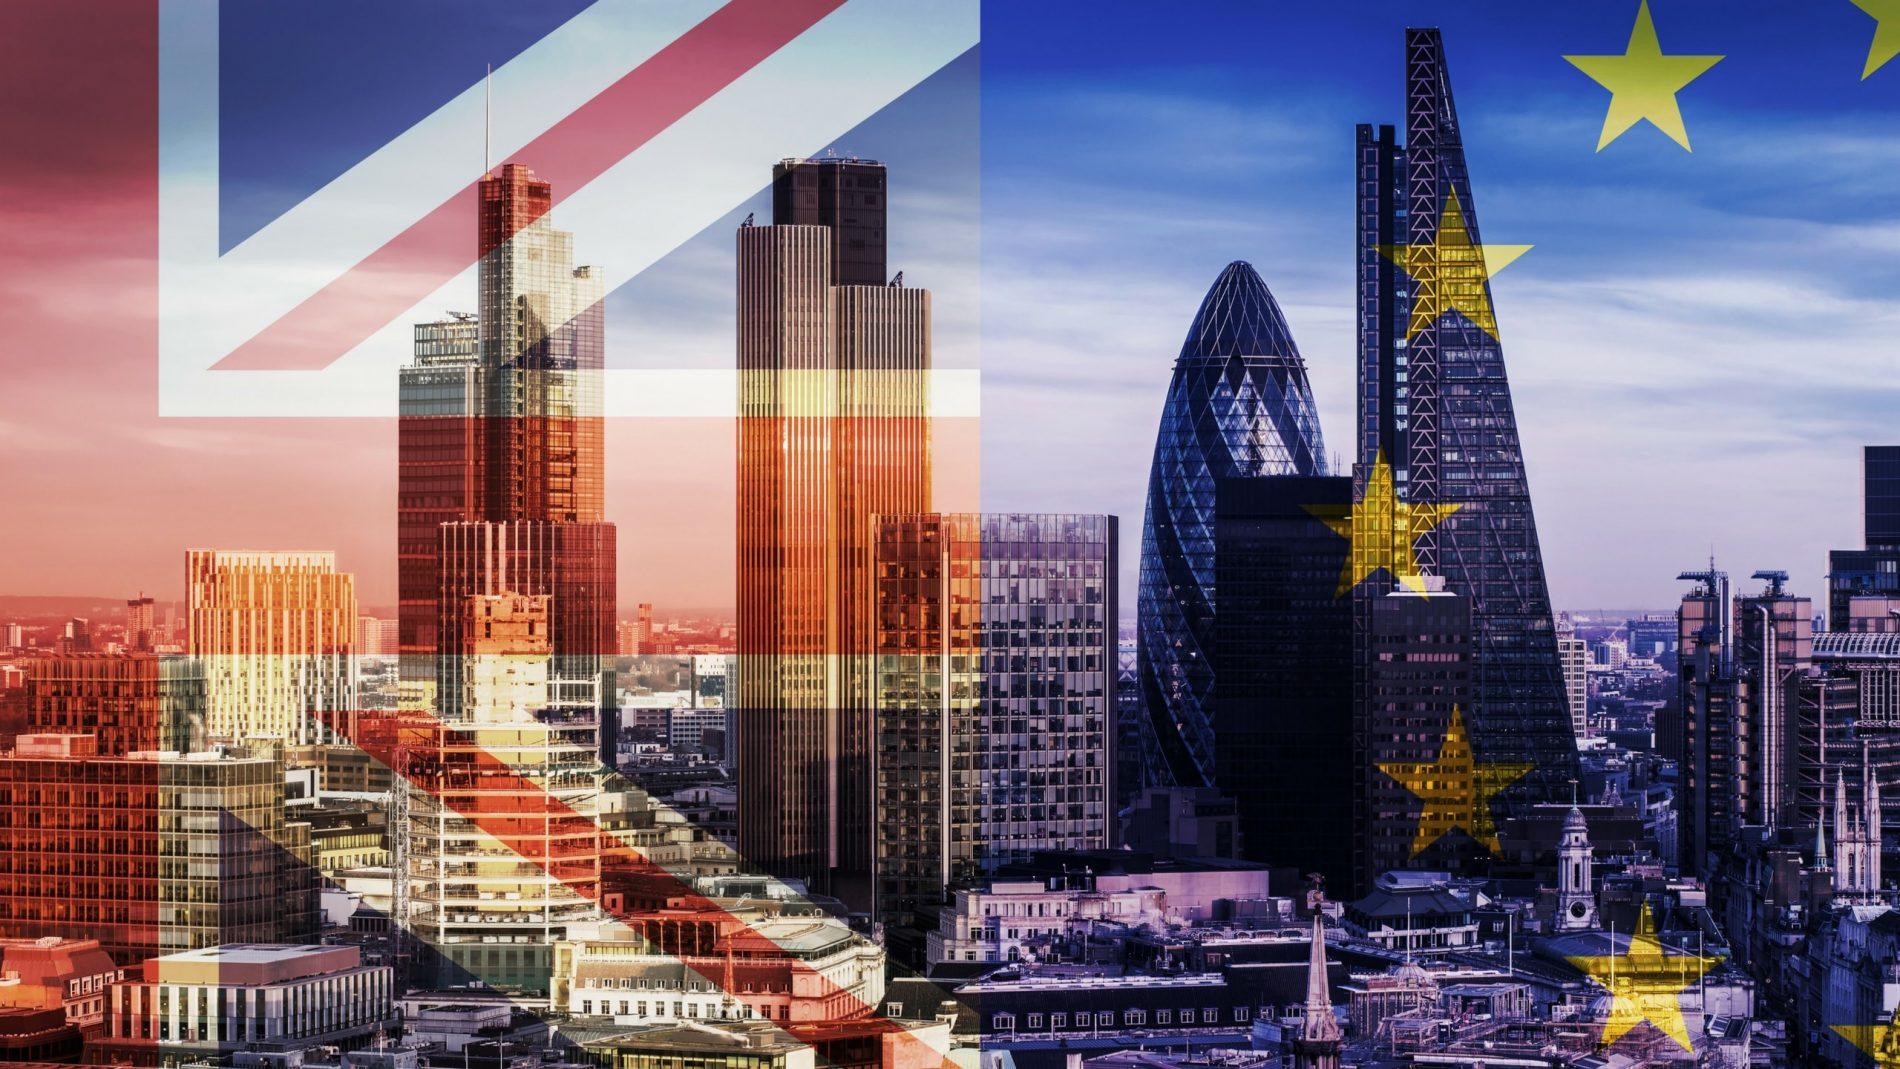 Despite Brexit Online Furniture Sales Continue to Grow